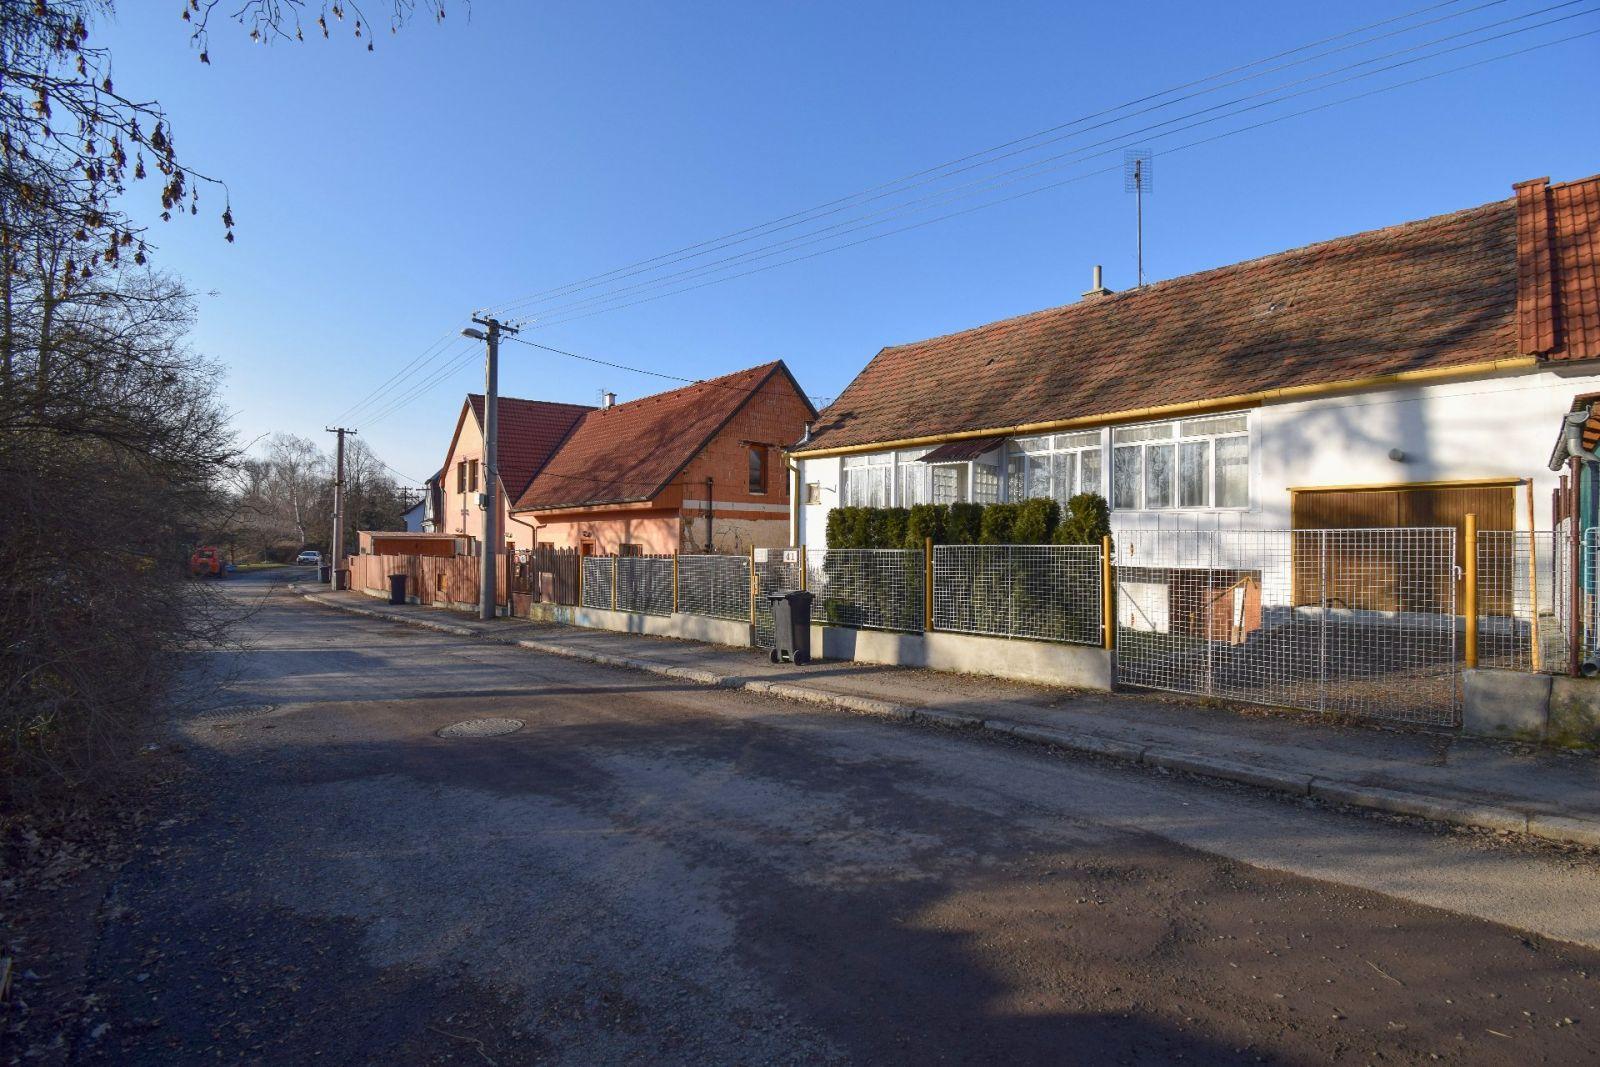 Prodej rodinného domu 90m2 - Plzeň - Koterov